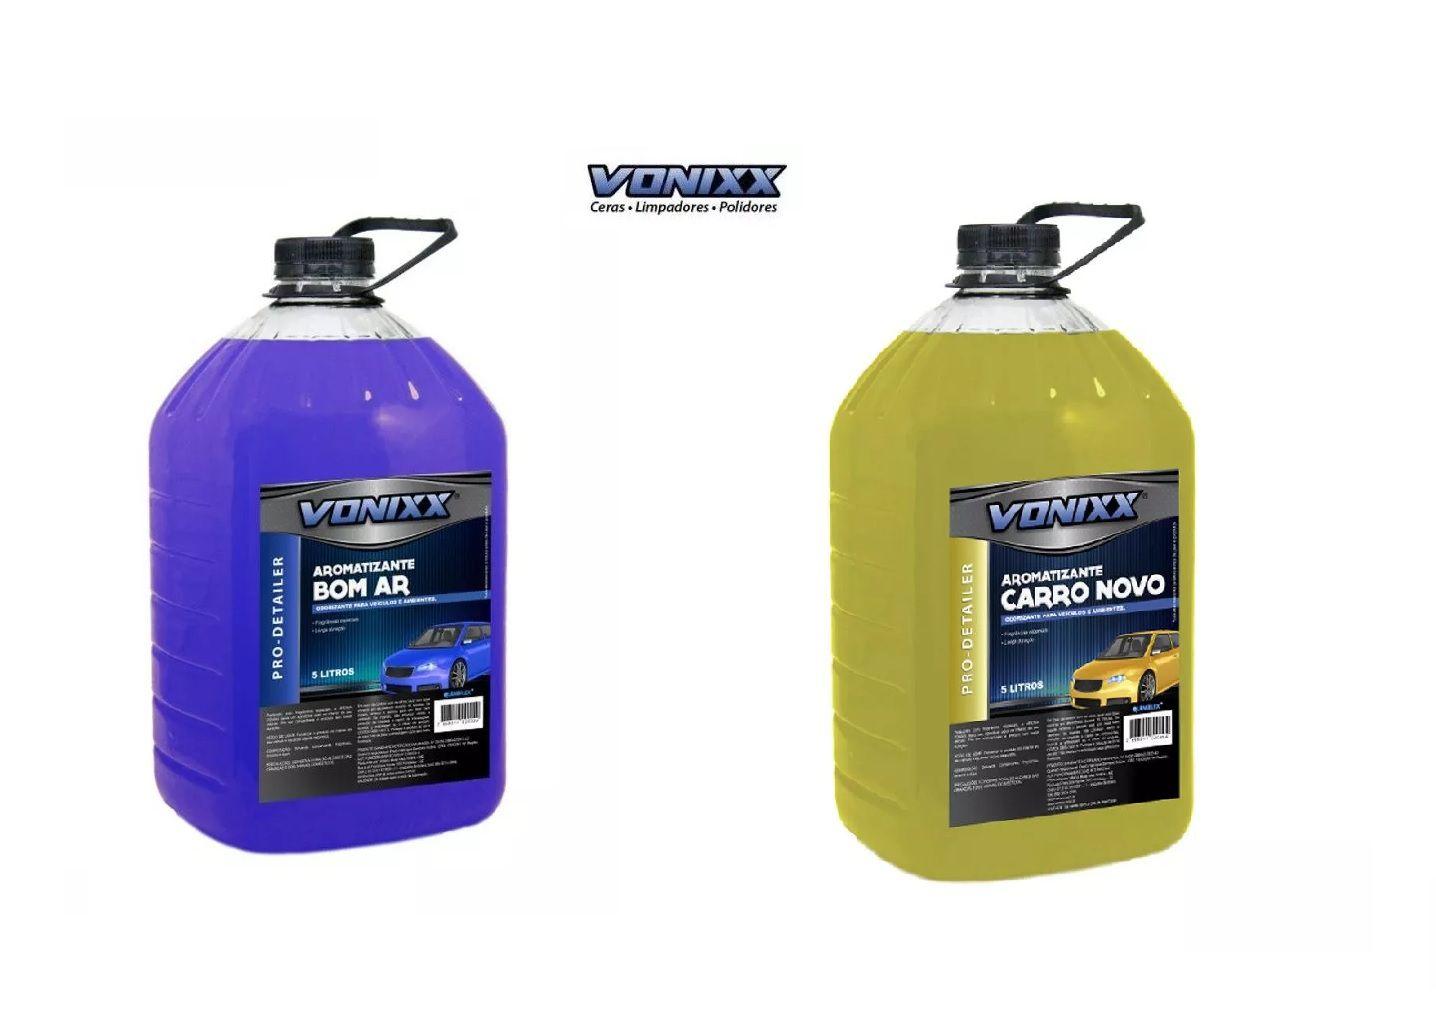 Kit 2 Aromatizantes Vonixx 1 Carro Novo + 1 Bom Ar